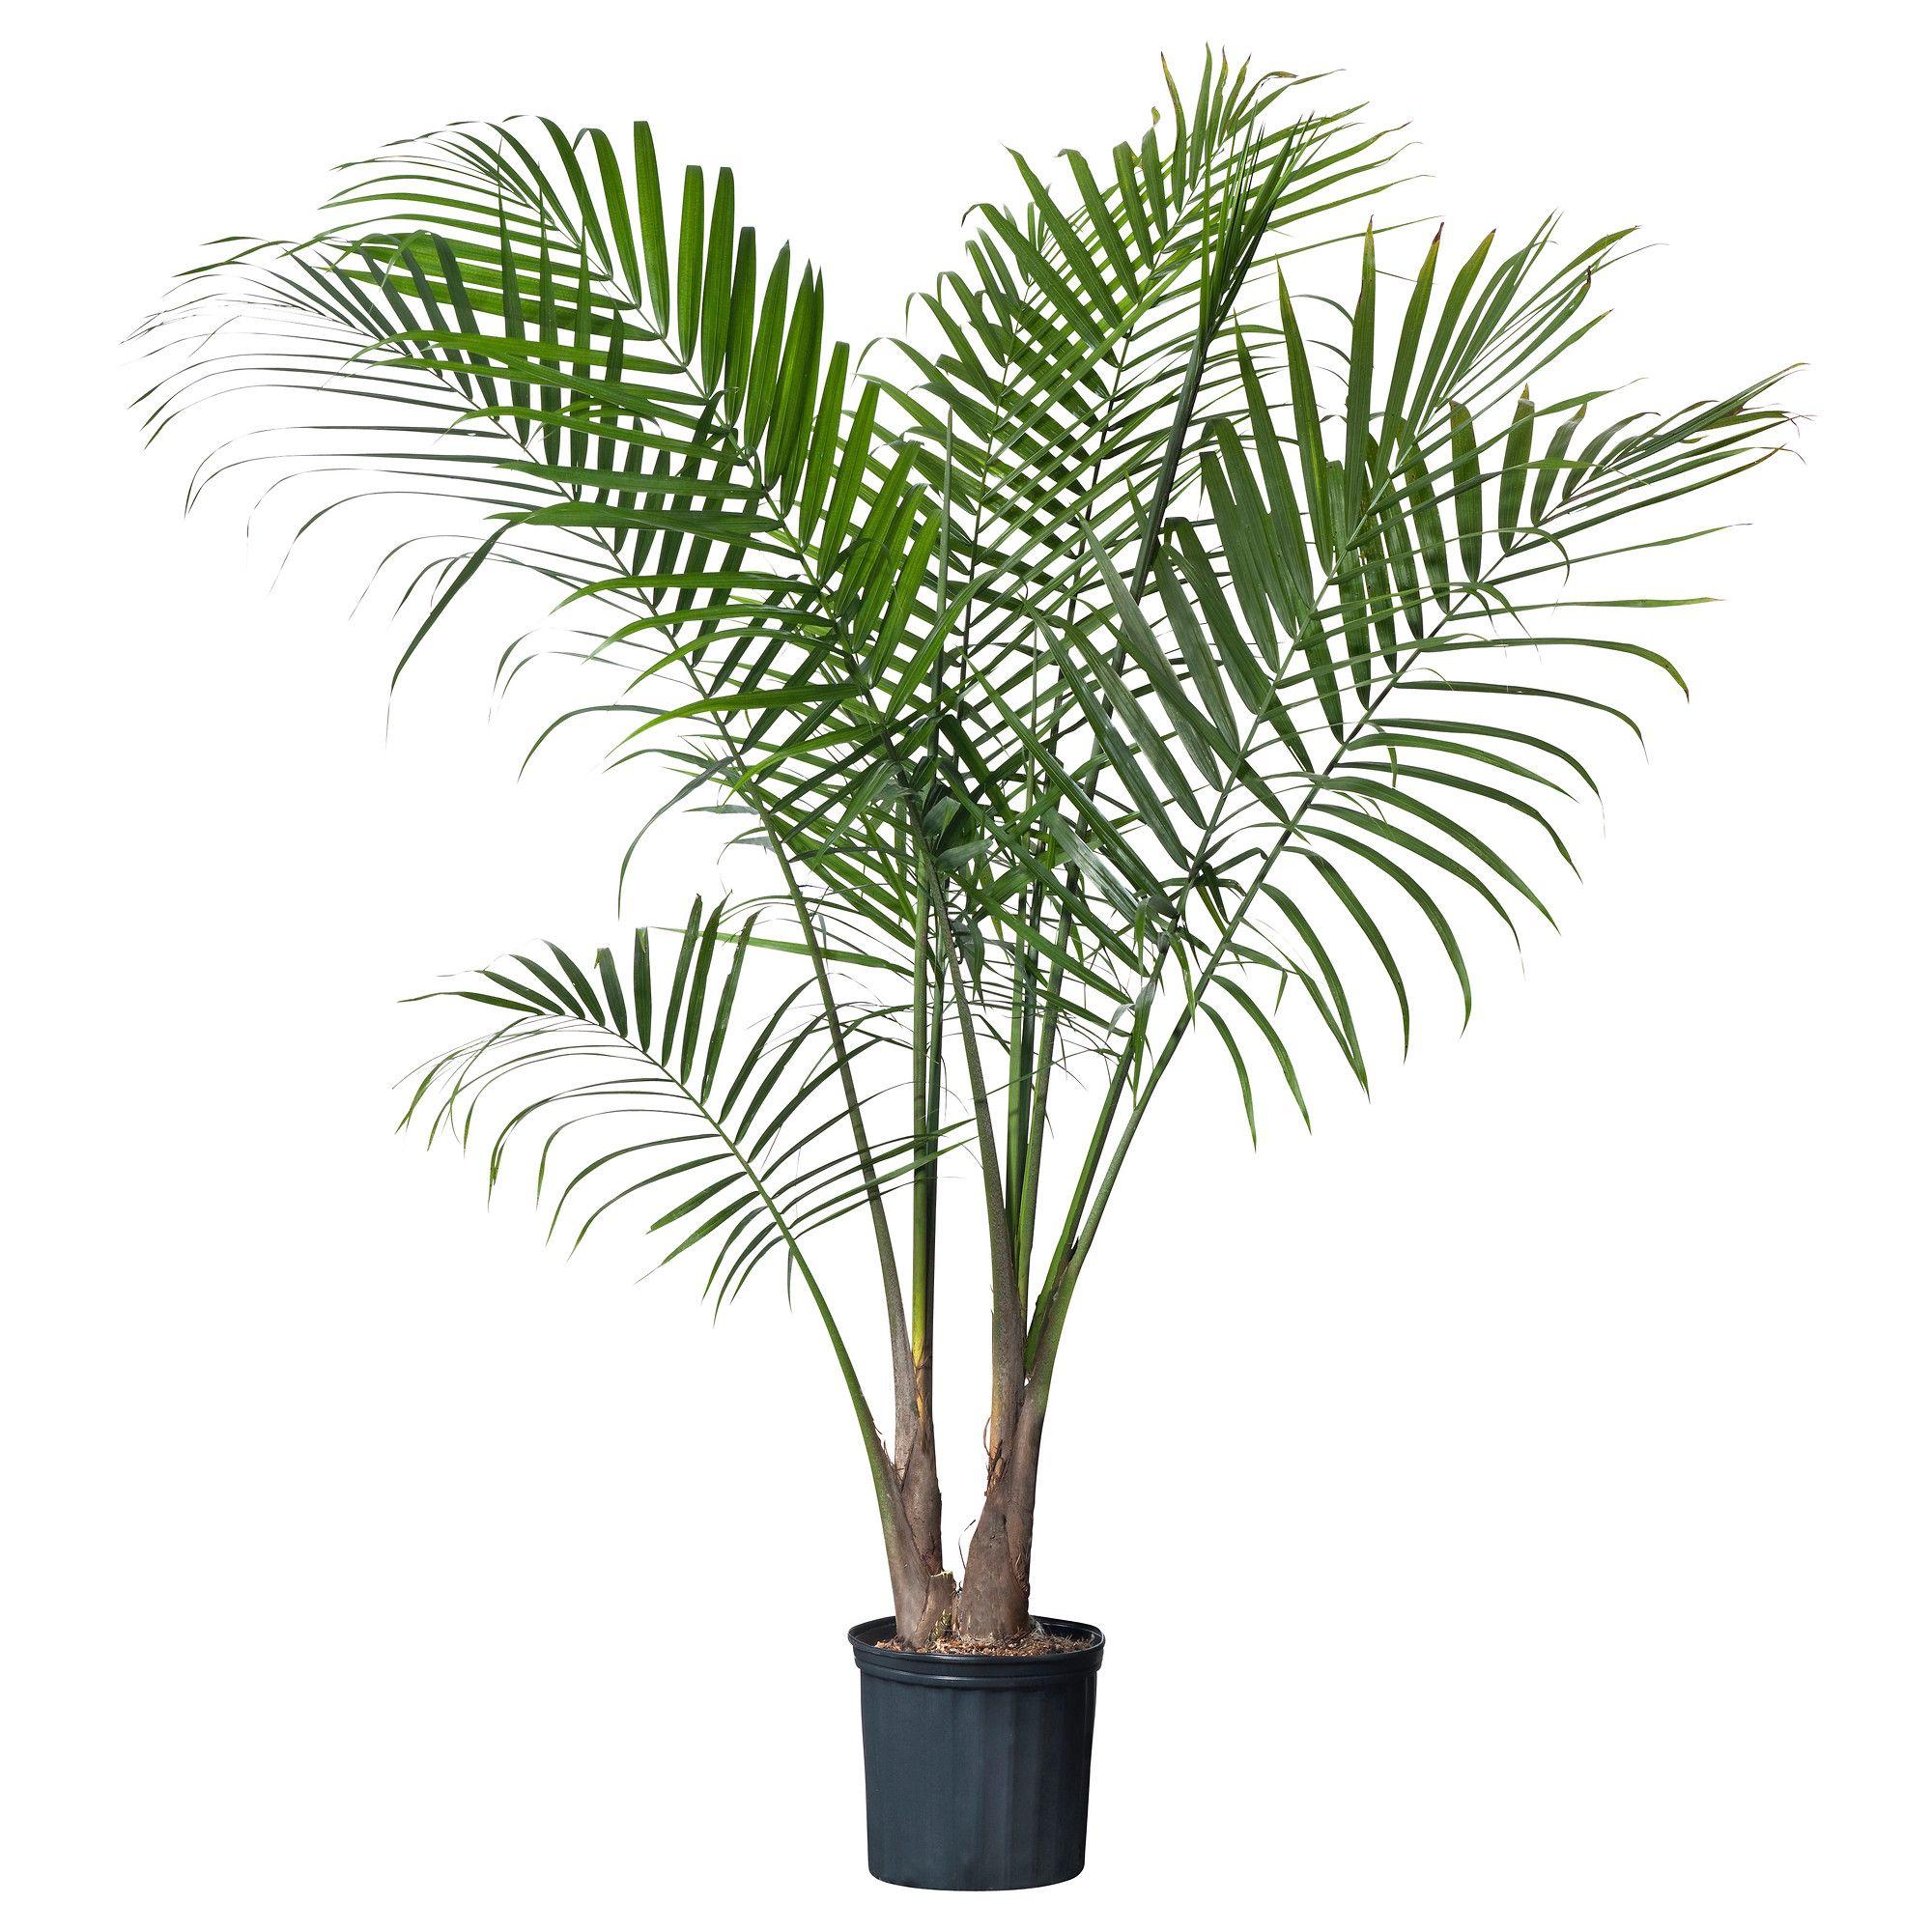 5b8db7f16b9a9112fca4ffd7334d77ca Palm Bark Houseplants on palm shrubs, palm border, palm vector, palm rats, palm drawing, palm flowers, palm roses, palm bonsai, palm shoot, palm pattern, palm chamaedorea seifrizii, palm leaf chickee, palm diagram, palm seeds, palm leaf cut out, palm bamboo, palm christmas, palm tr, palm trees, palm beetle,